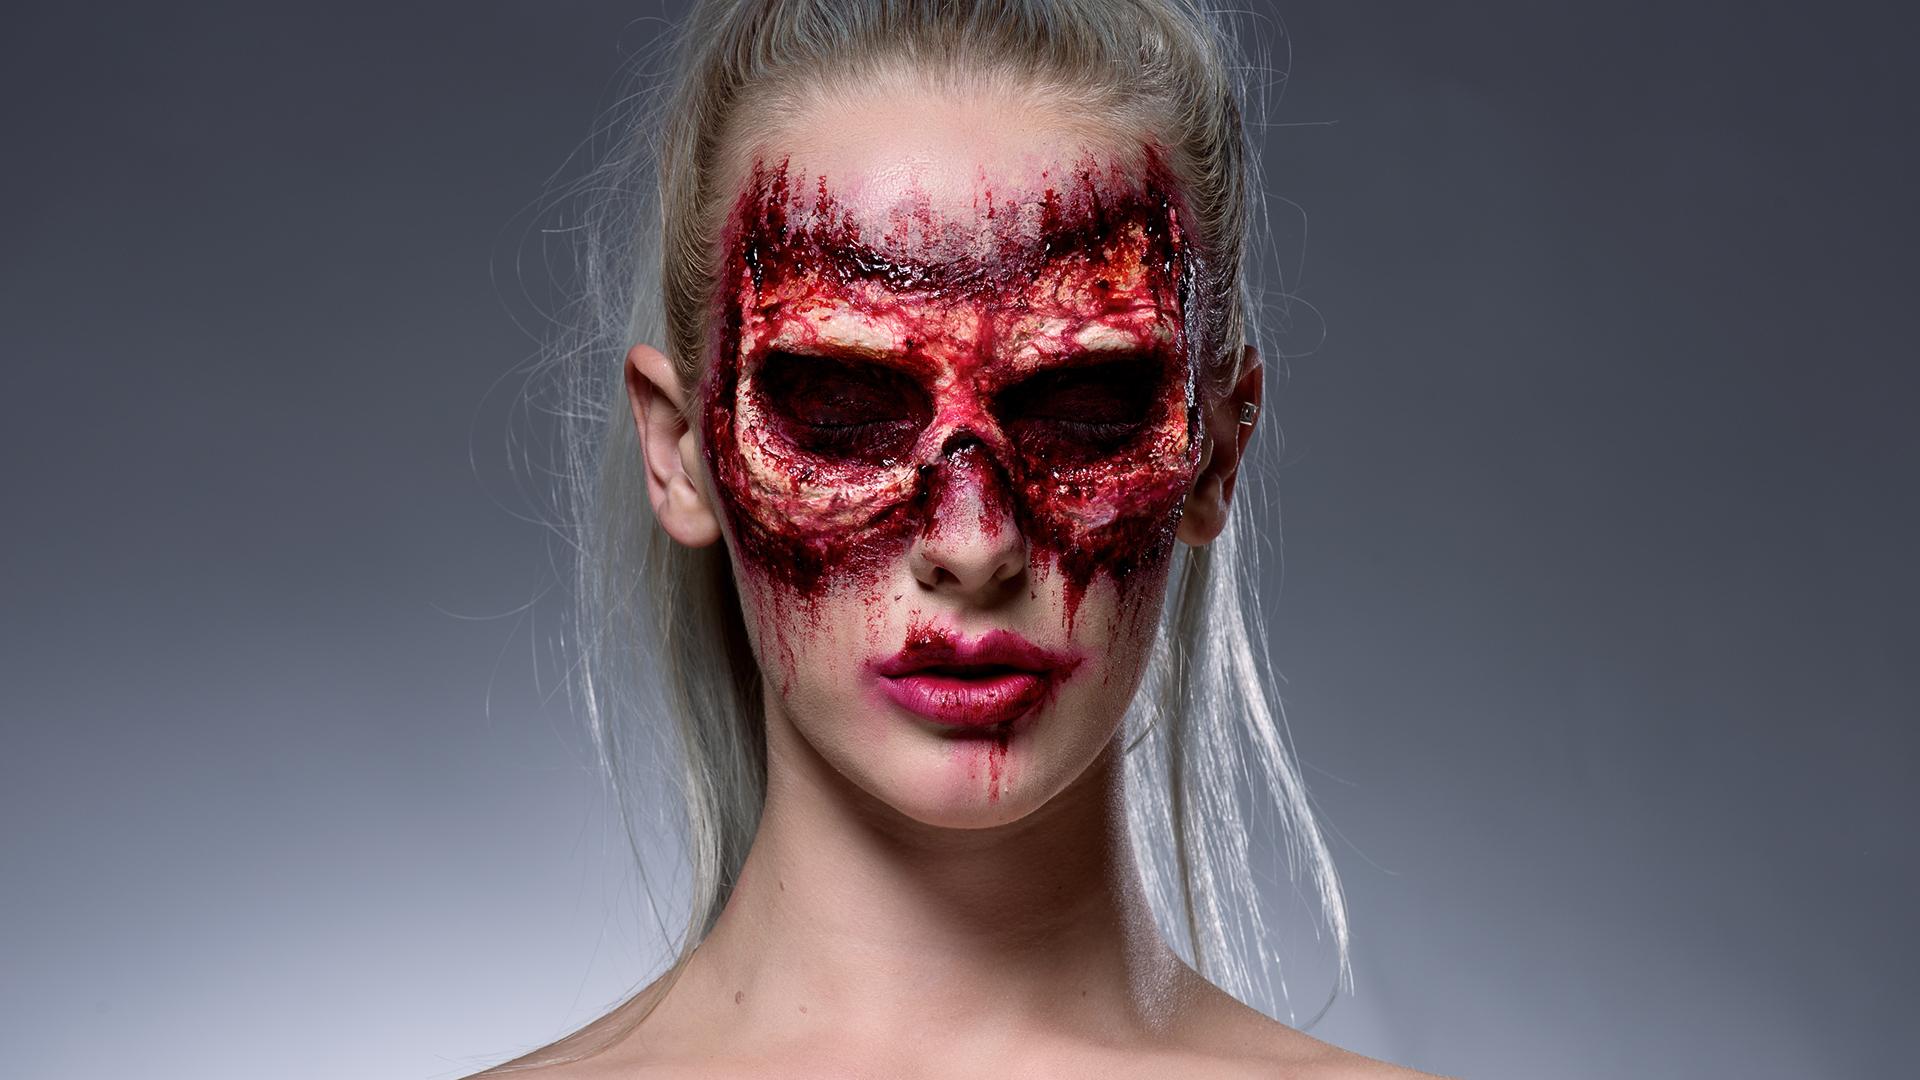 62 Halloween Makeup Tutorials To Make Halloween More Creepy - A ...